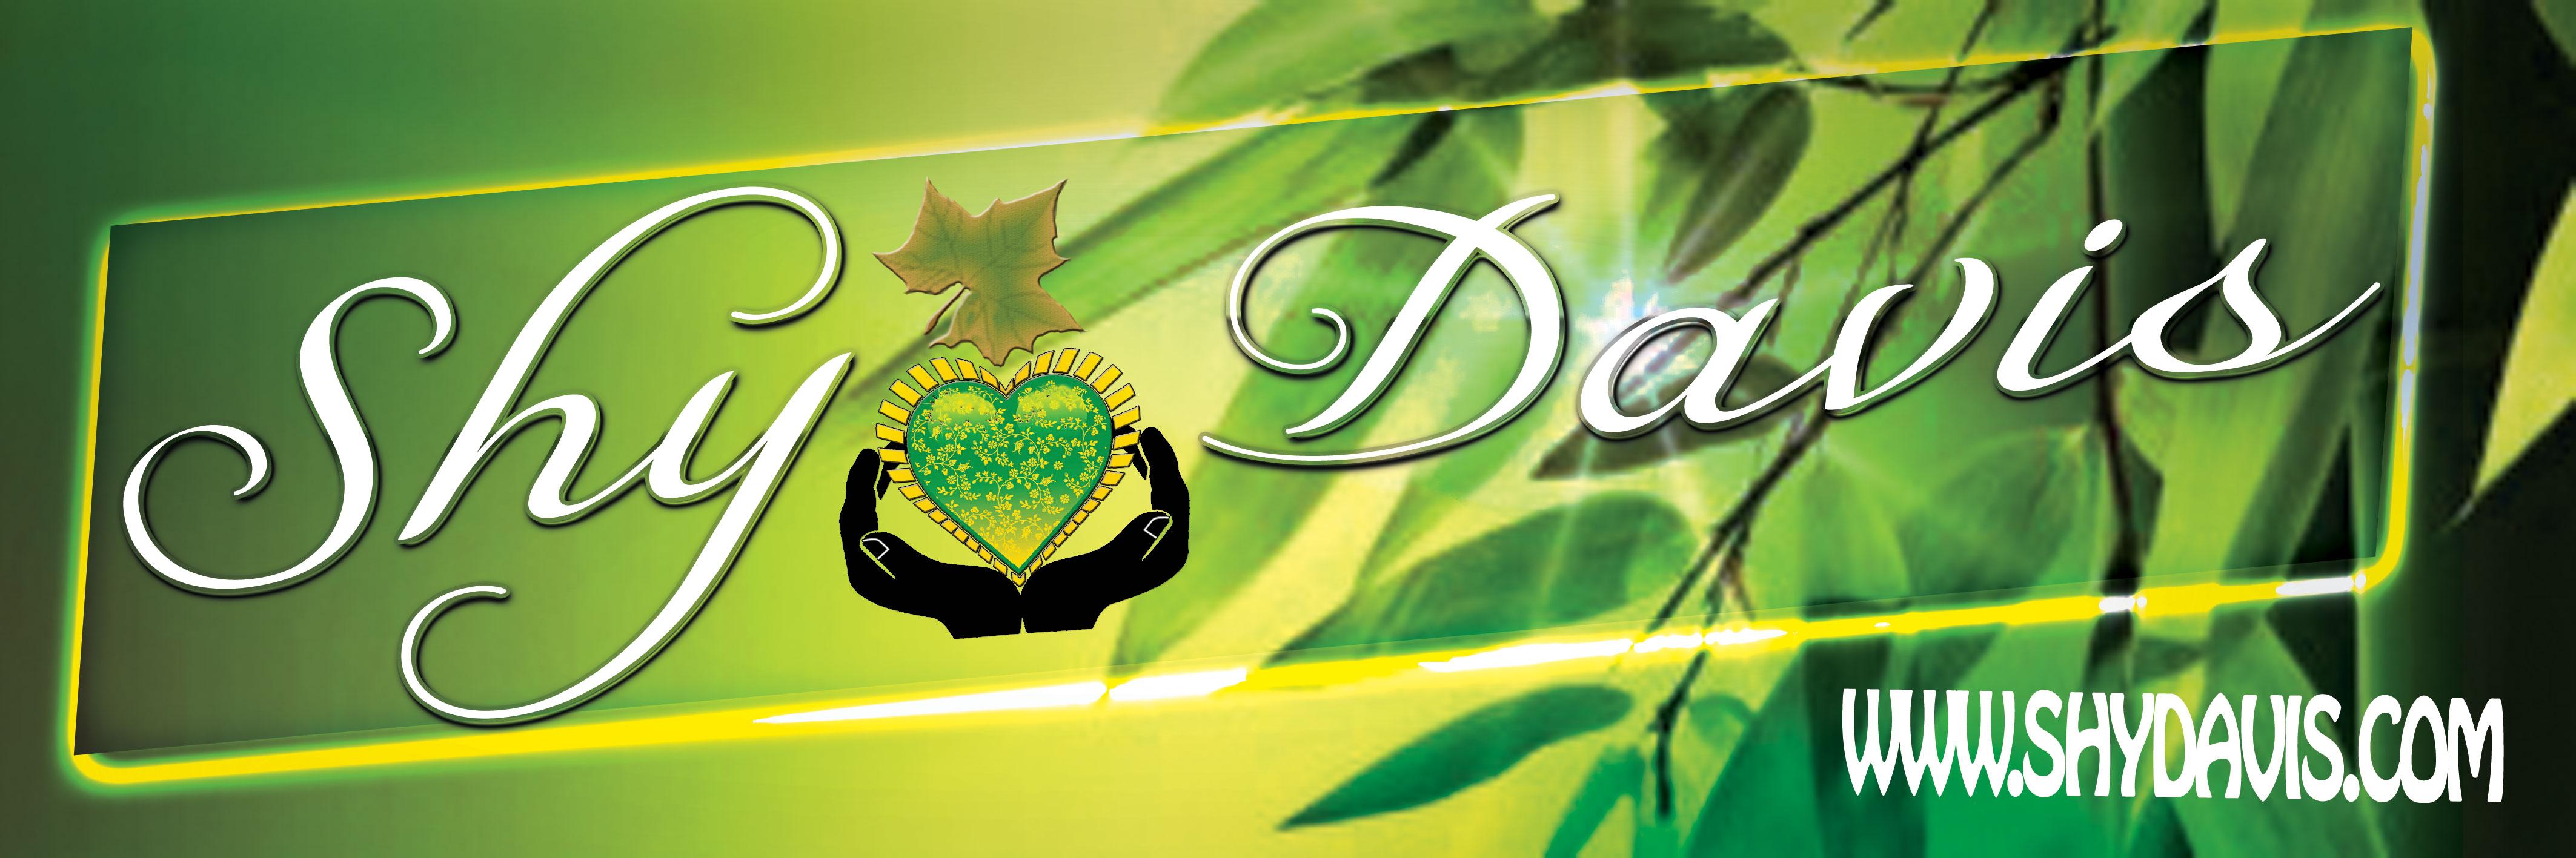 Shy-Davis-Banner-Branch